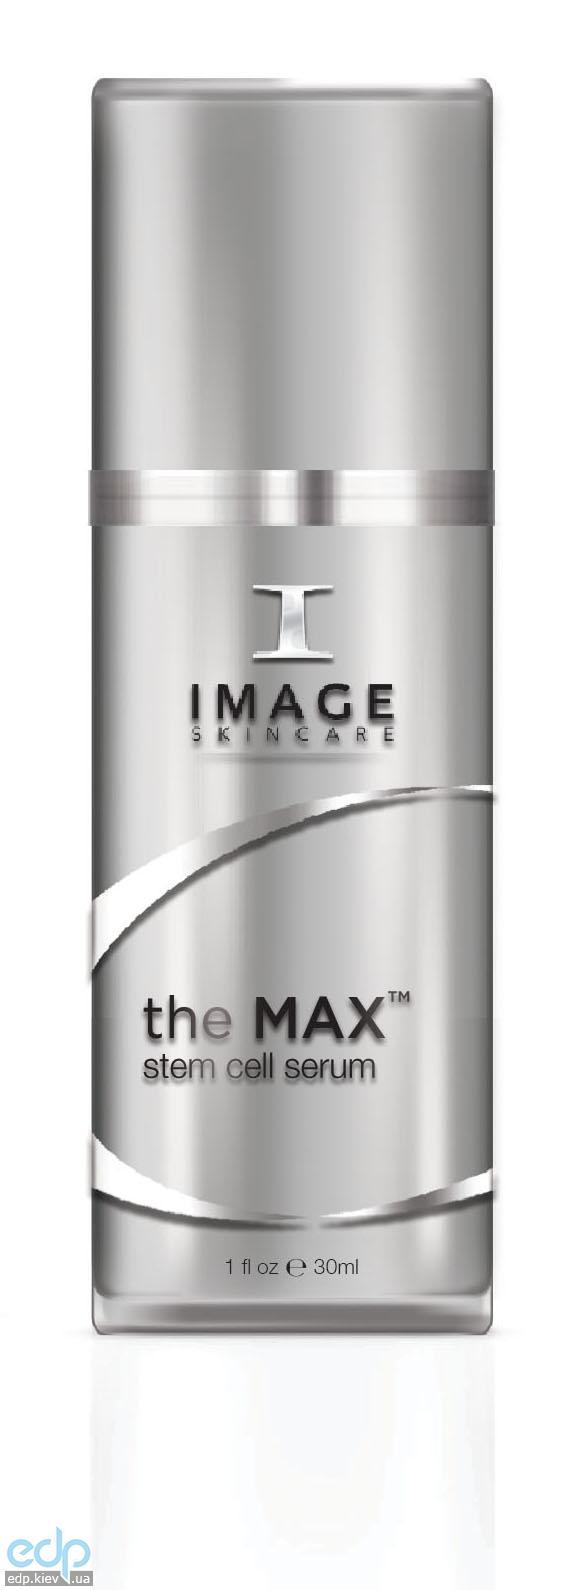 Image SkinCare - The MAX - Сыворотка Макс - 30 ml